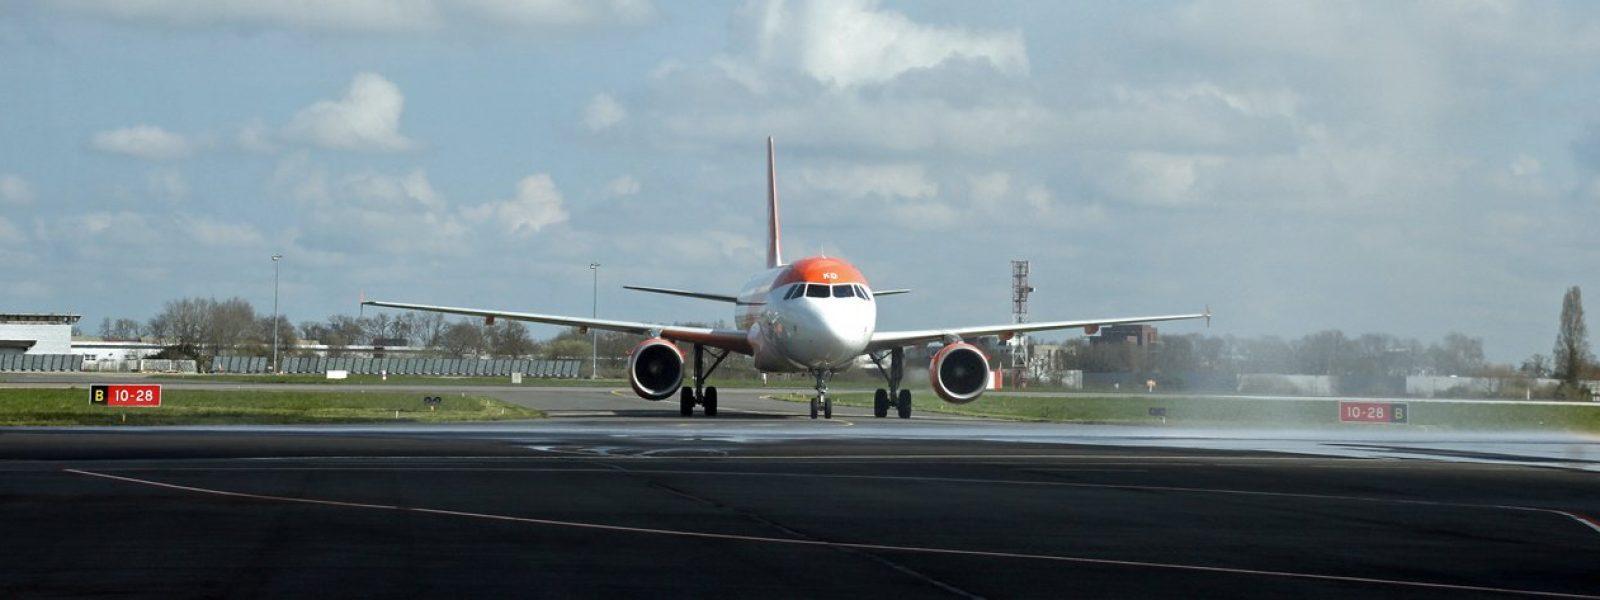 Easy-jet - Rennes